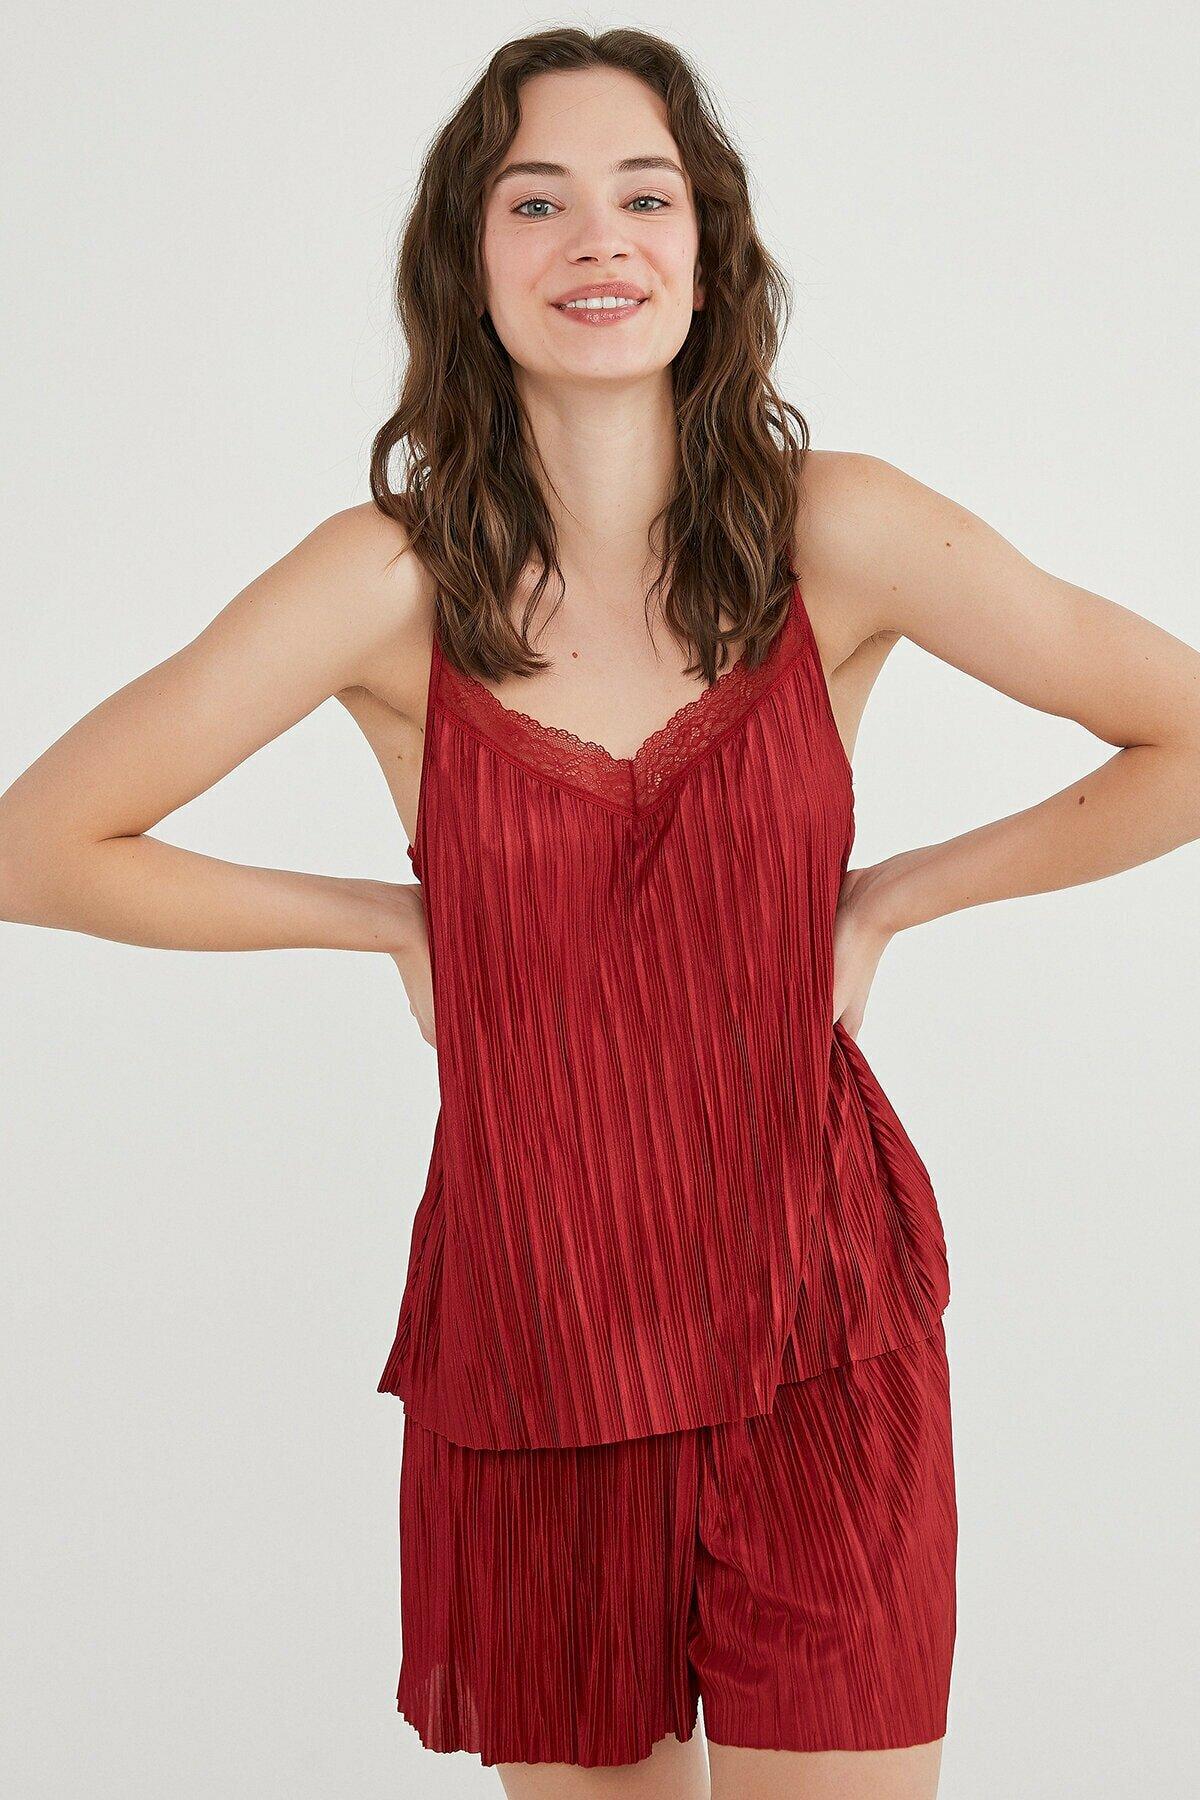 Women's Pajamas Short Set of 2 Sweet Soft Comfortable Singlets and Shorts Summer Pajamas 2021 Fashion Sexy